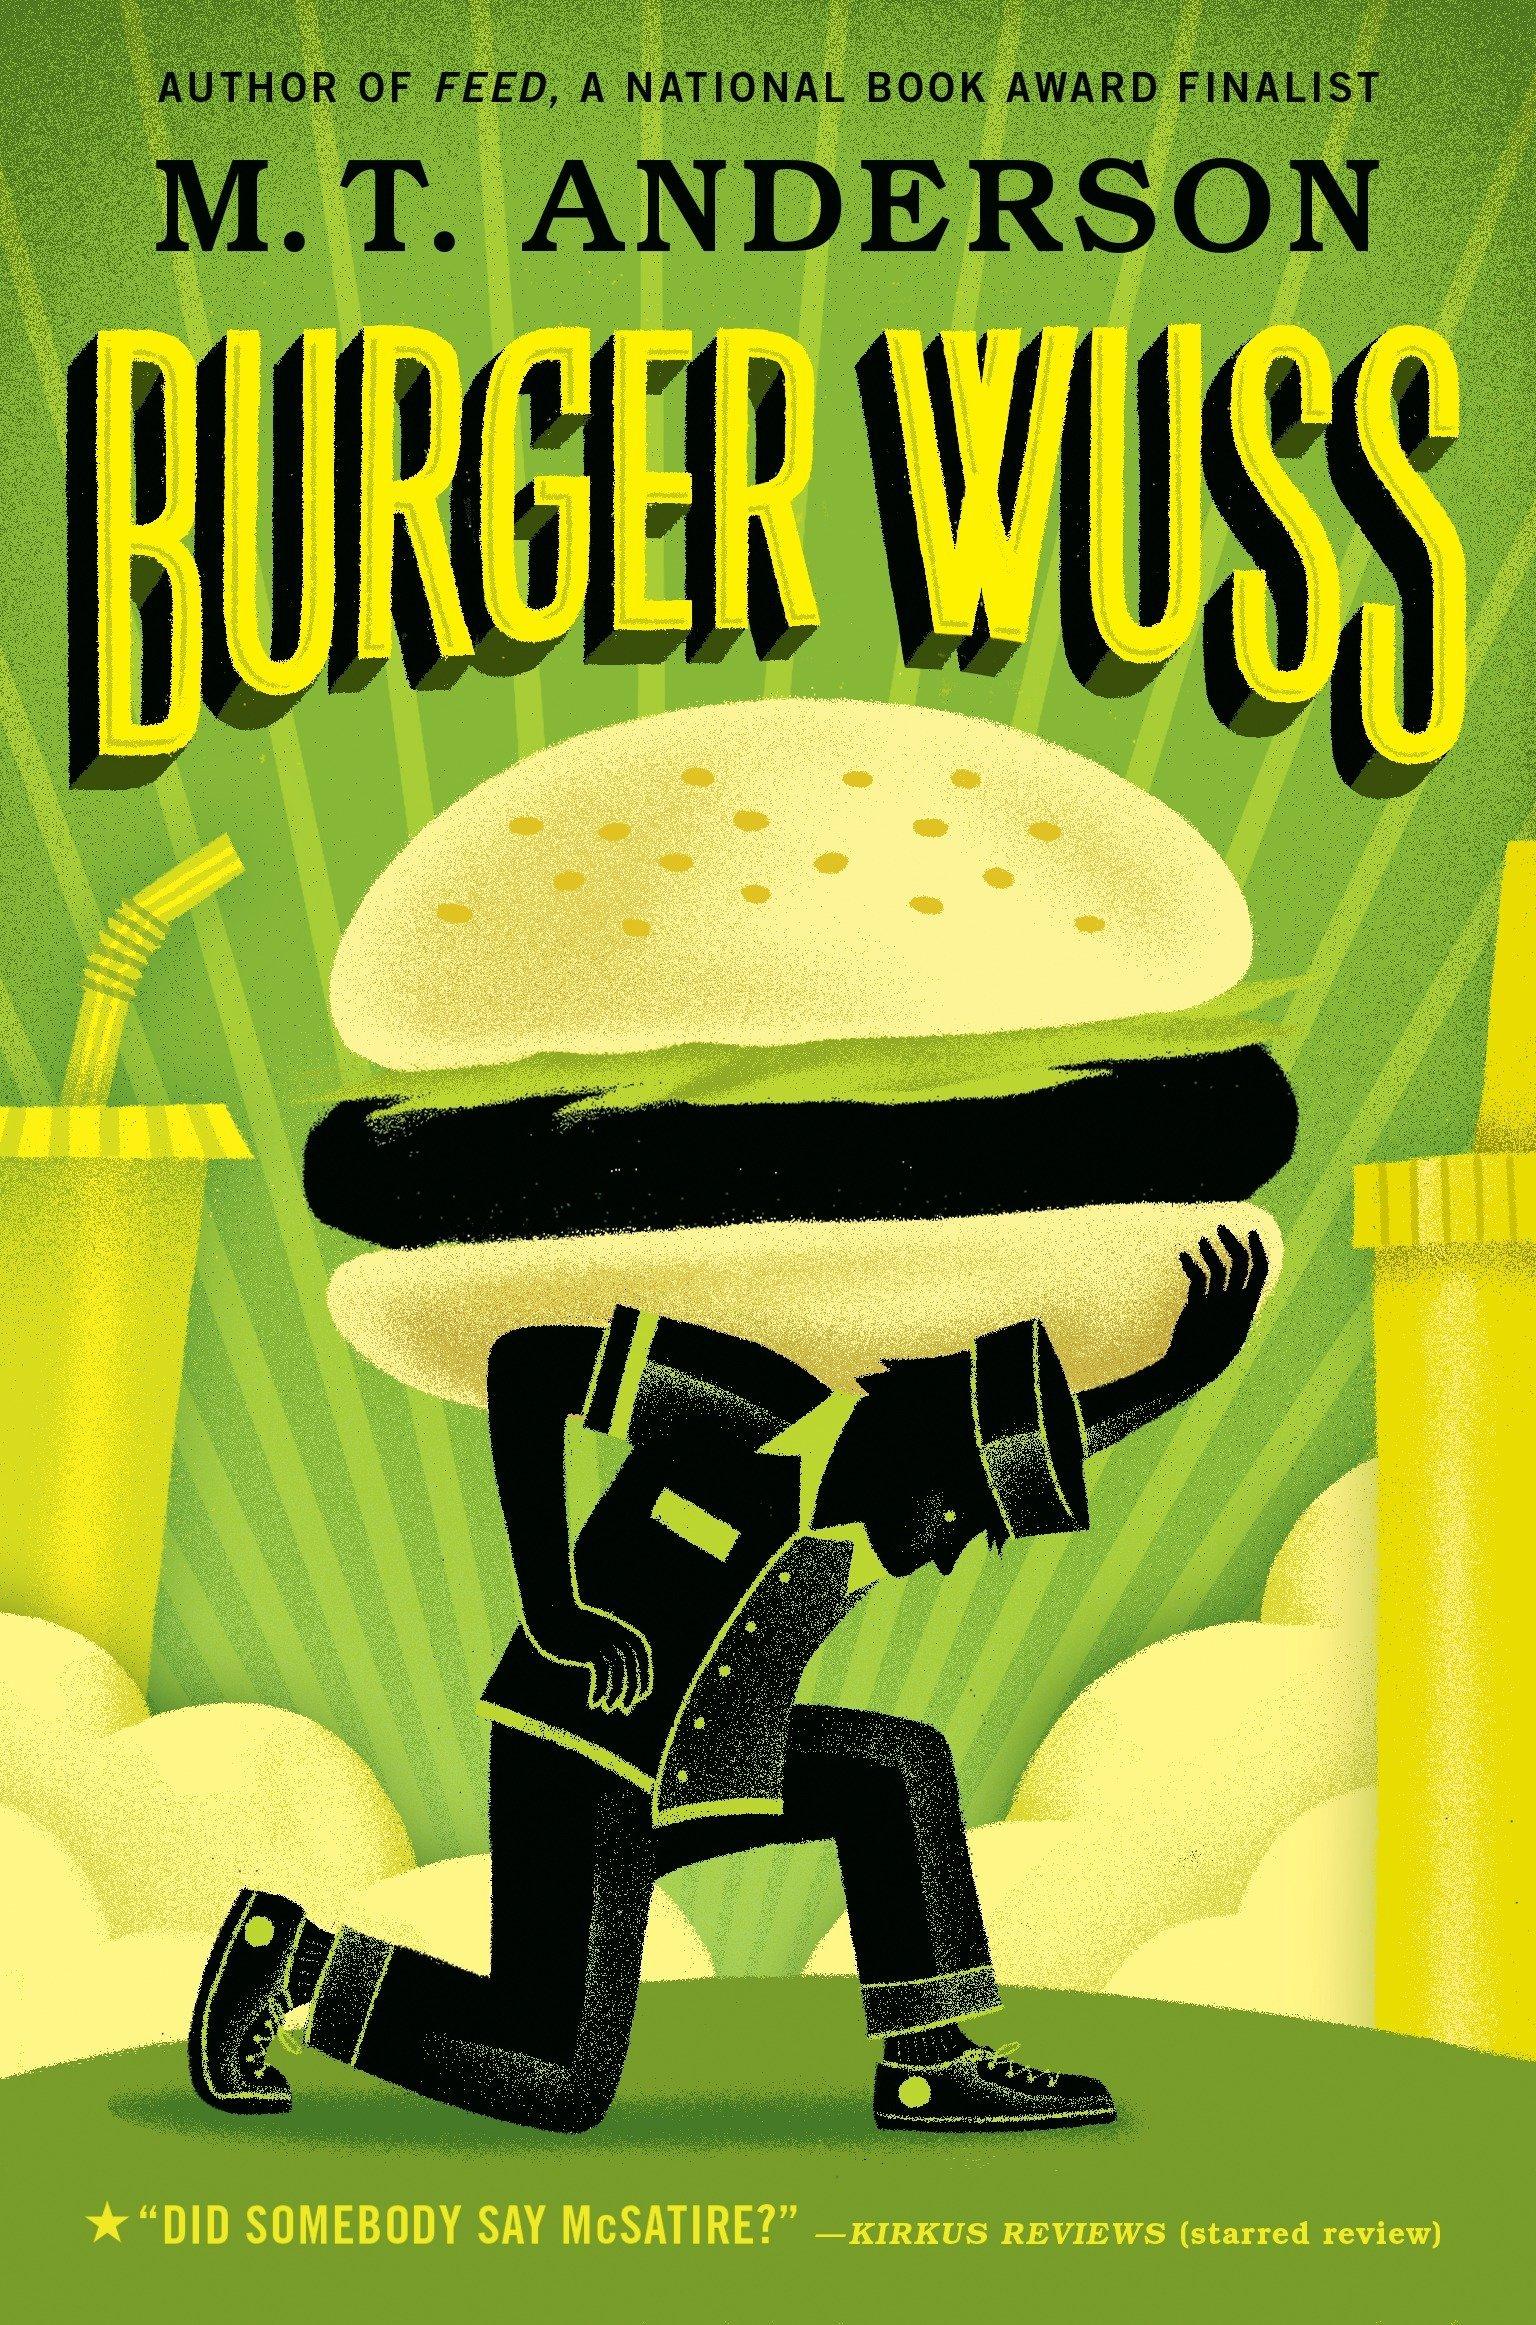 Amazon.com Burger Wuss 15 Anderson, M.T. Books